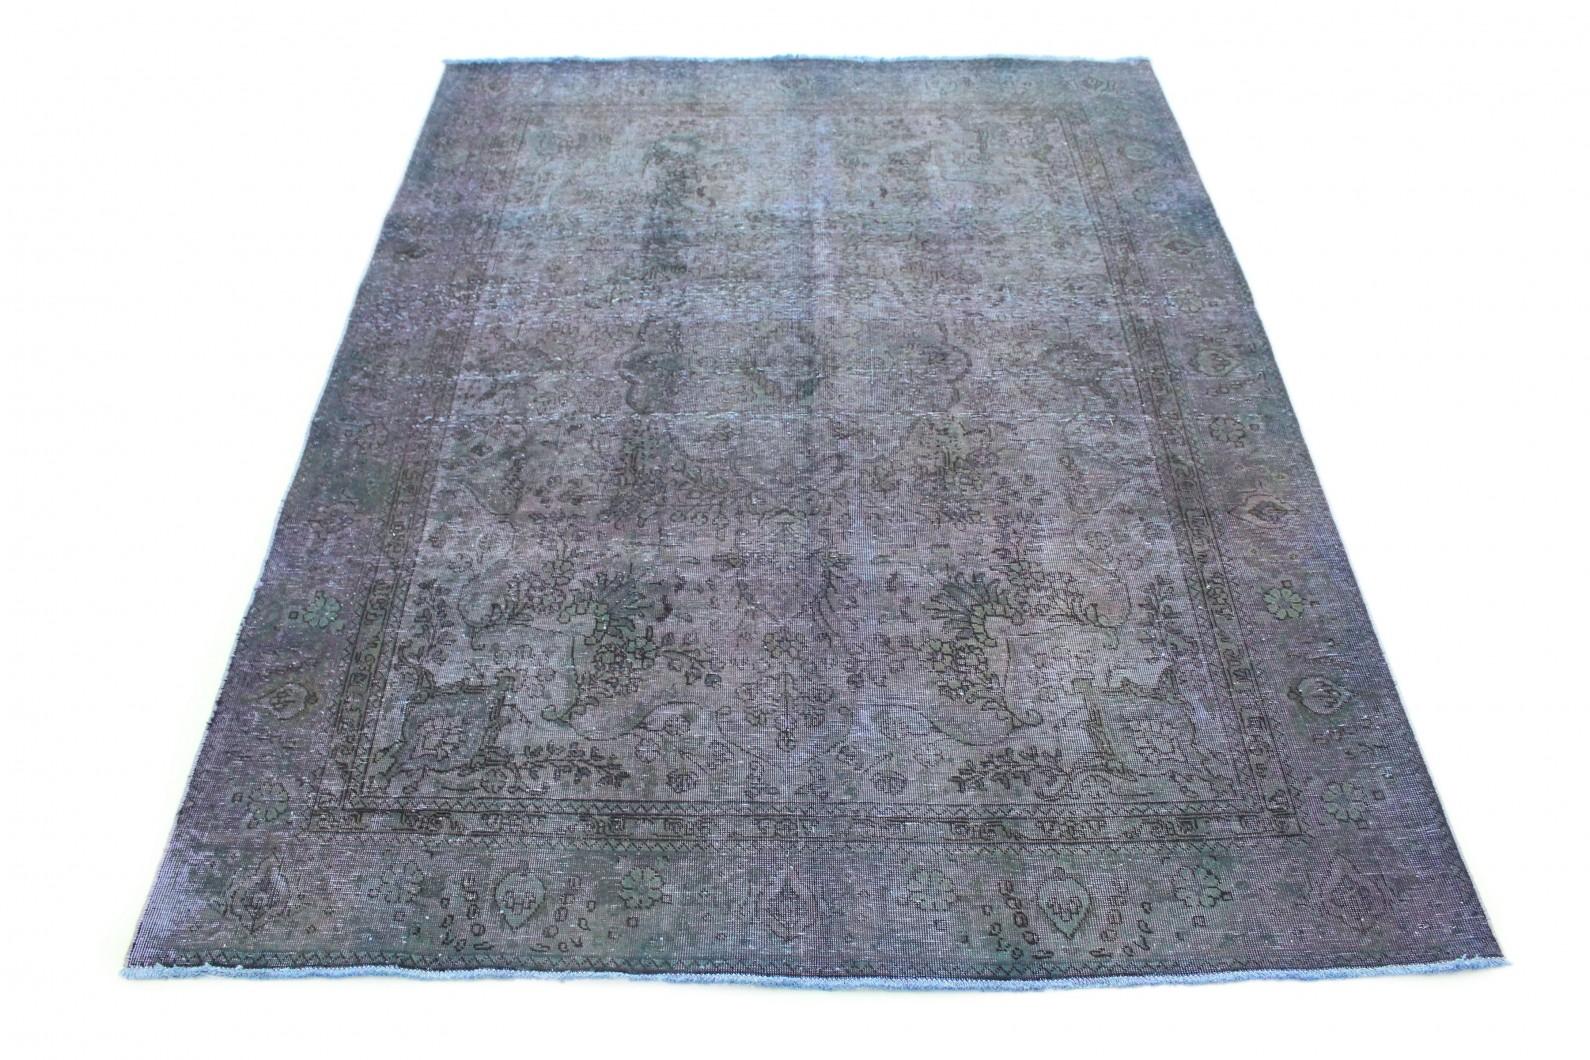 Carpetido Design Vintage-Teppich Lila Blau Grün in 270x200 (1 / 8)